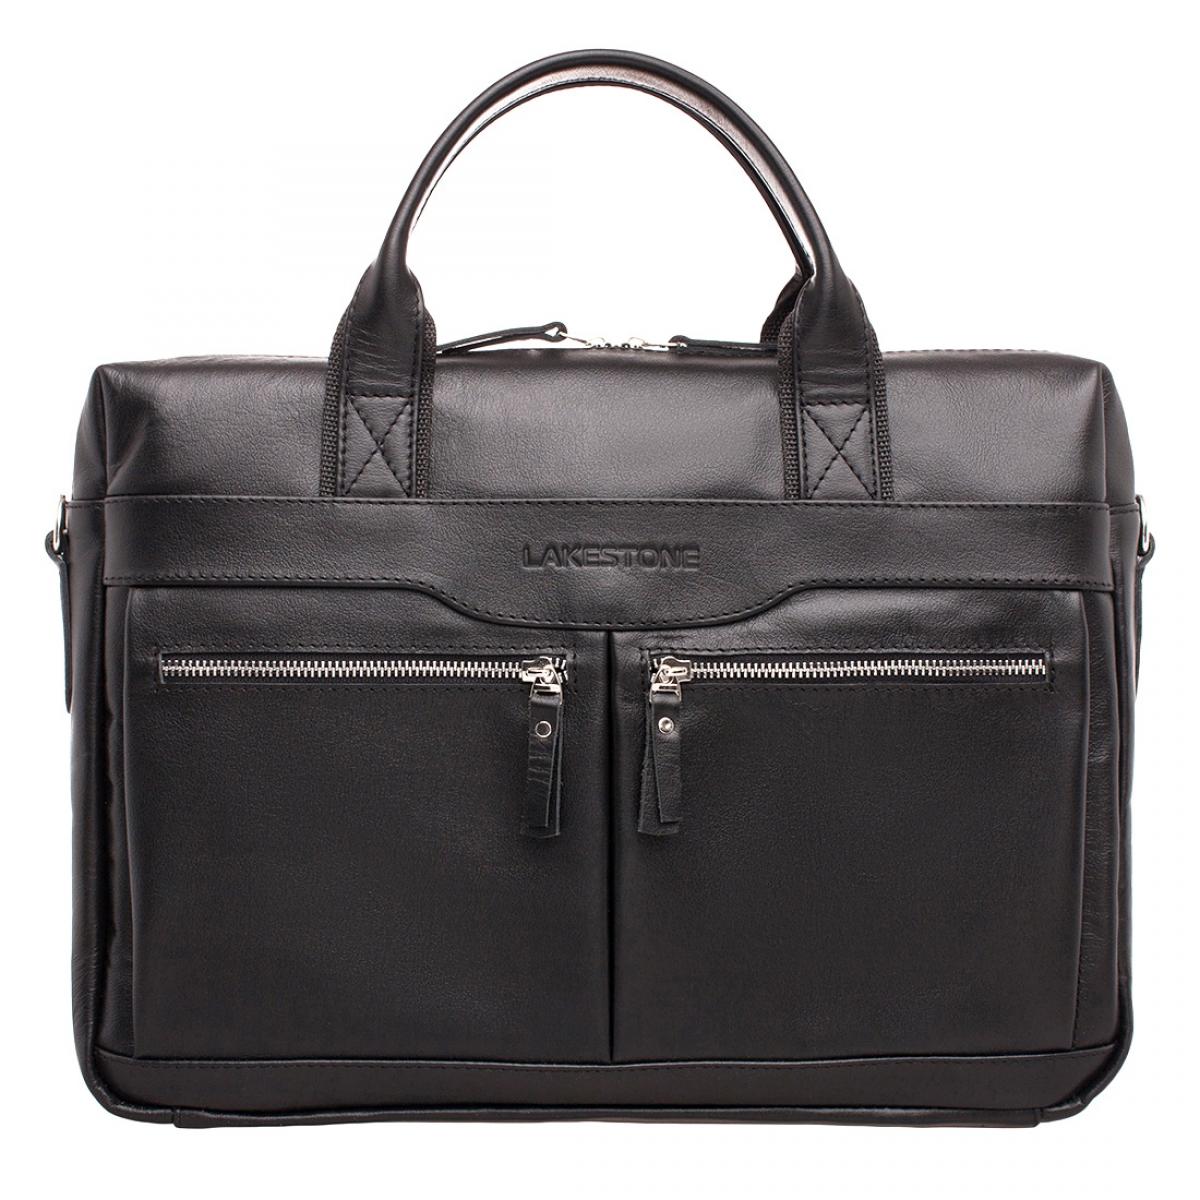 Lakestone Dorset Black., мужская  сумка